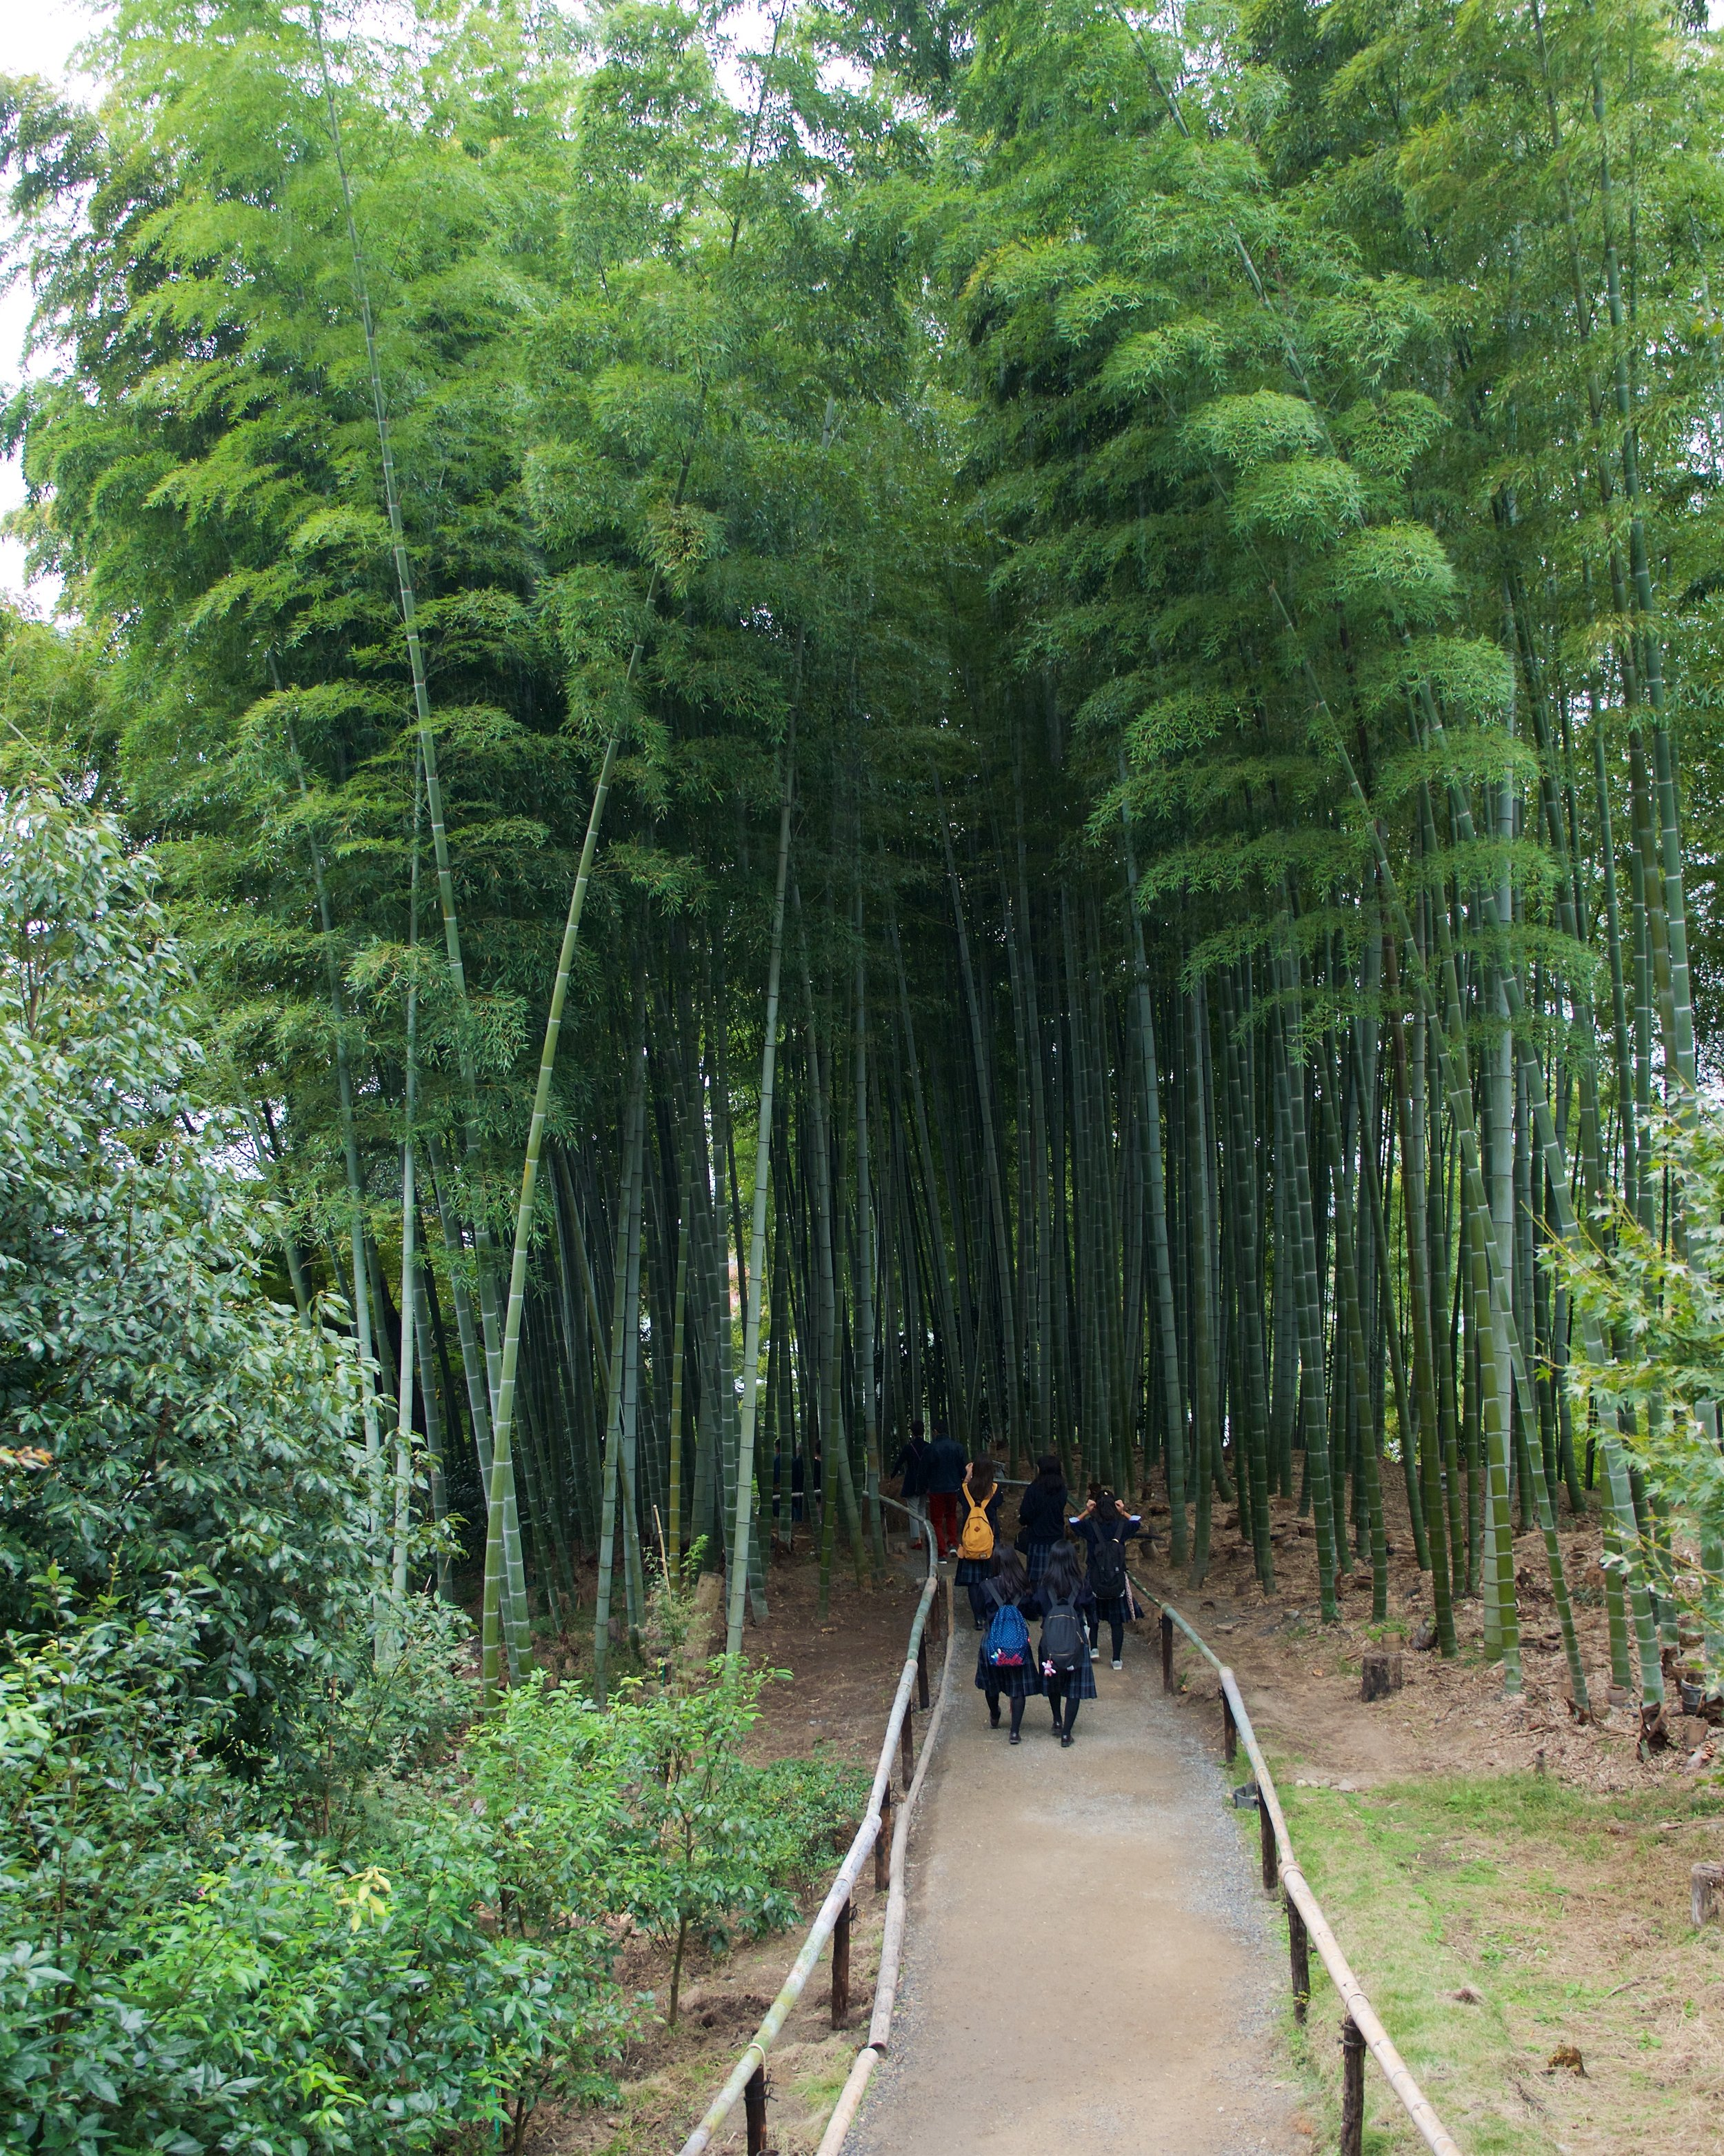 Bamboo forest at Kodaiji Temple